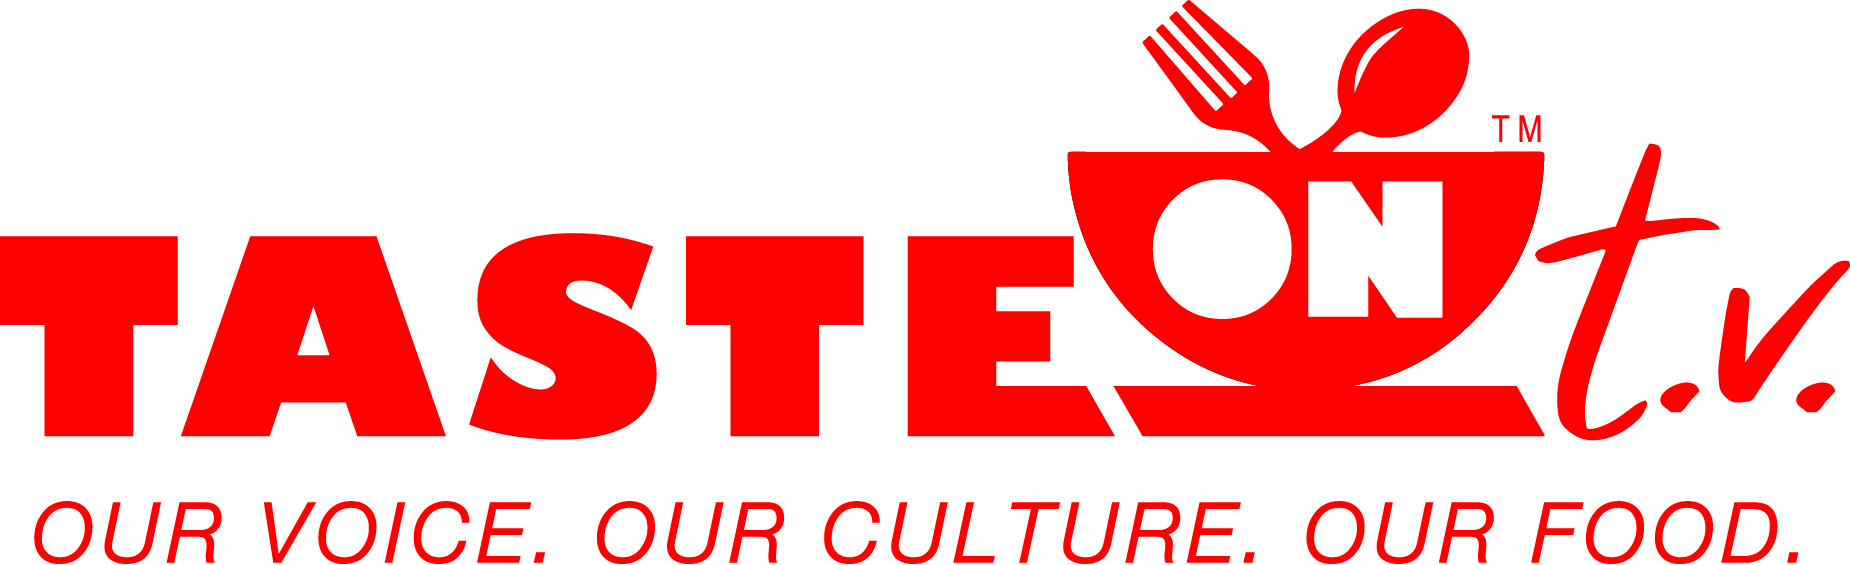 TasteavisionMedia Logo